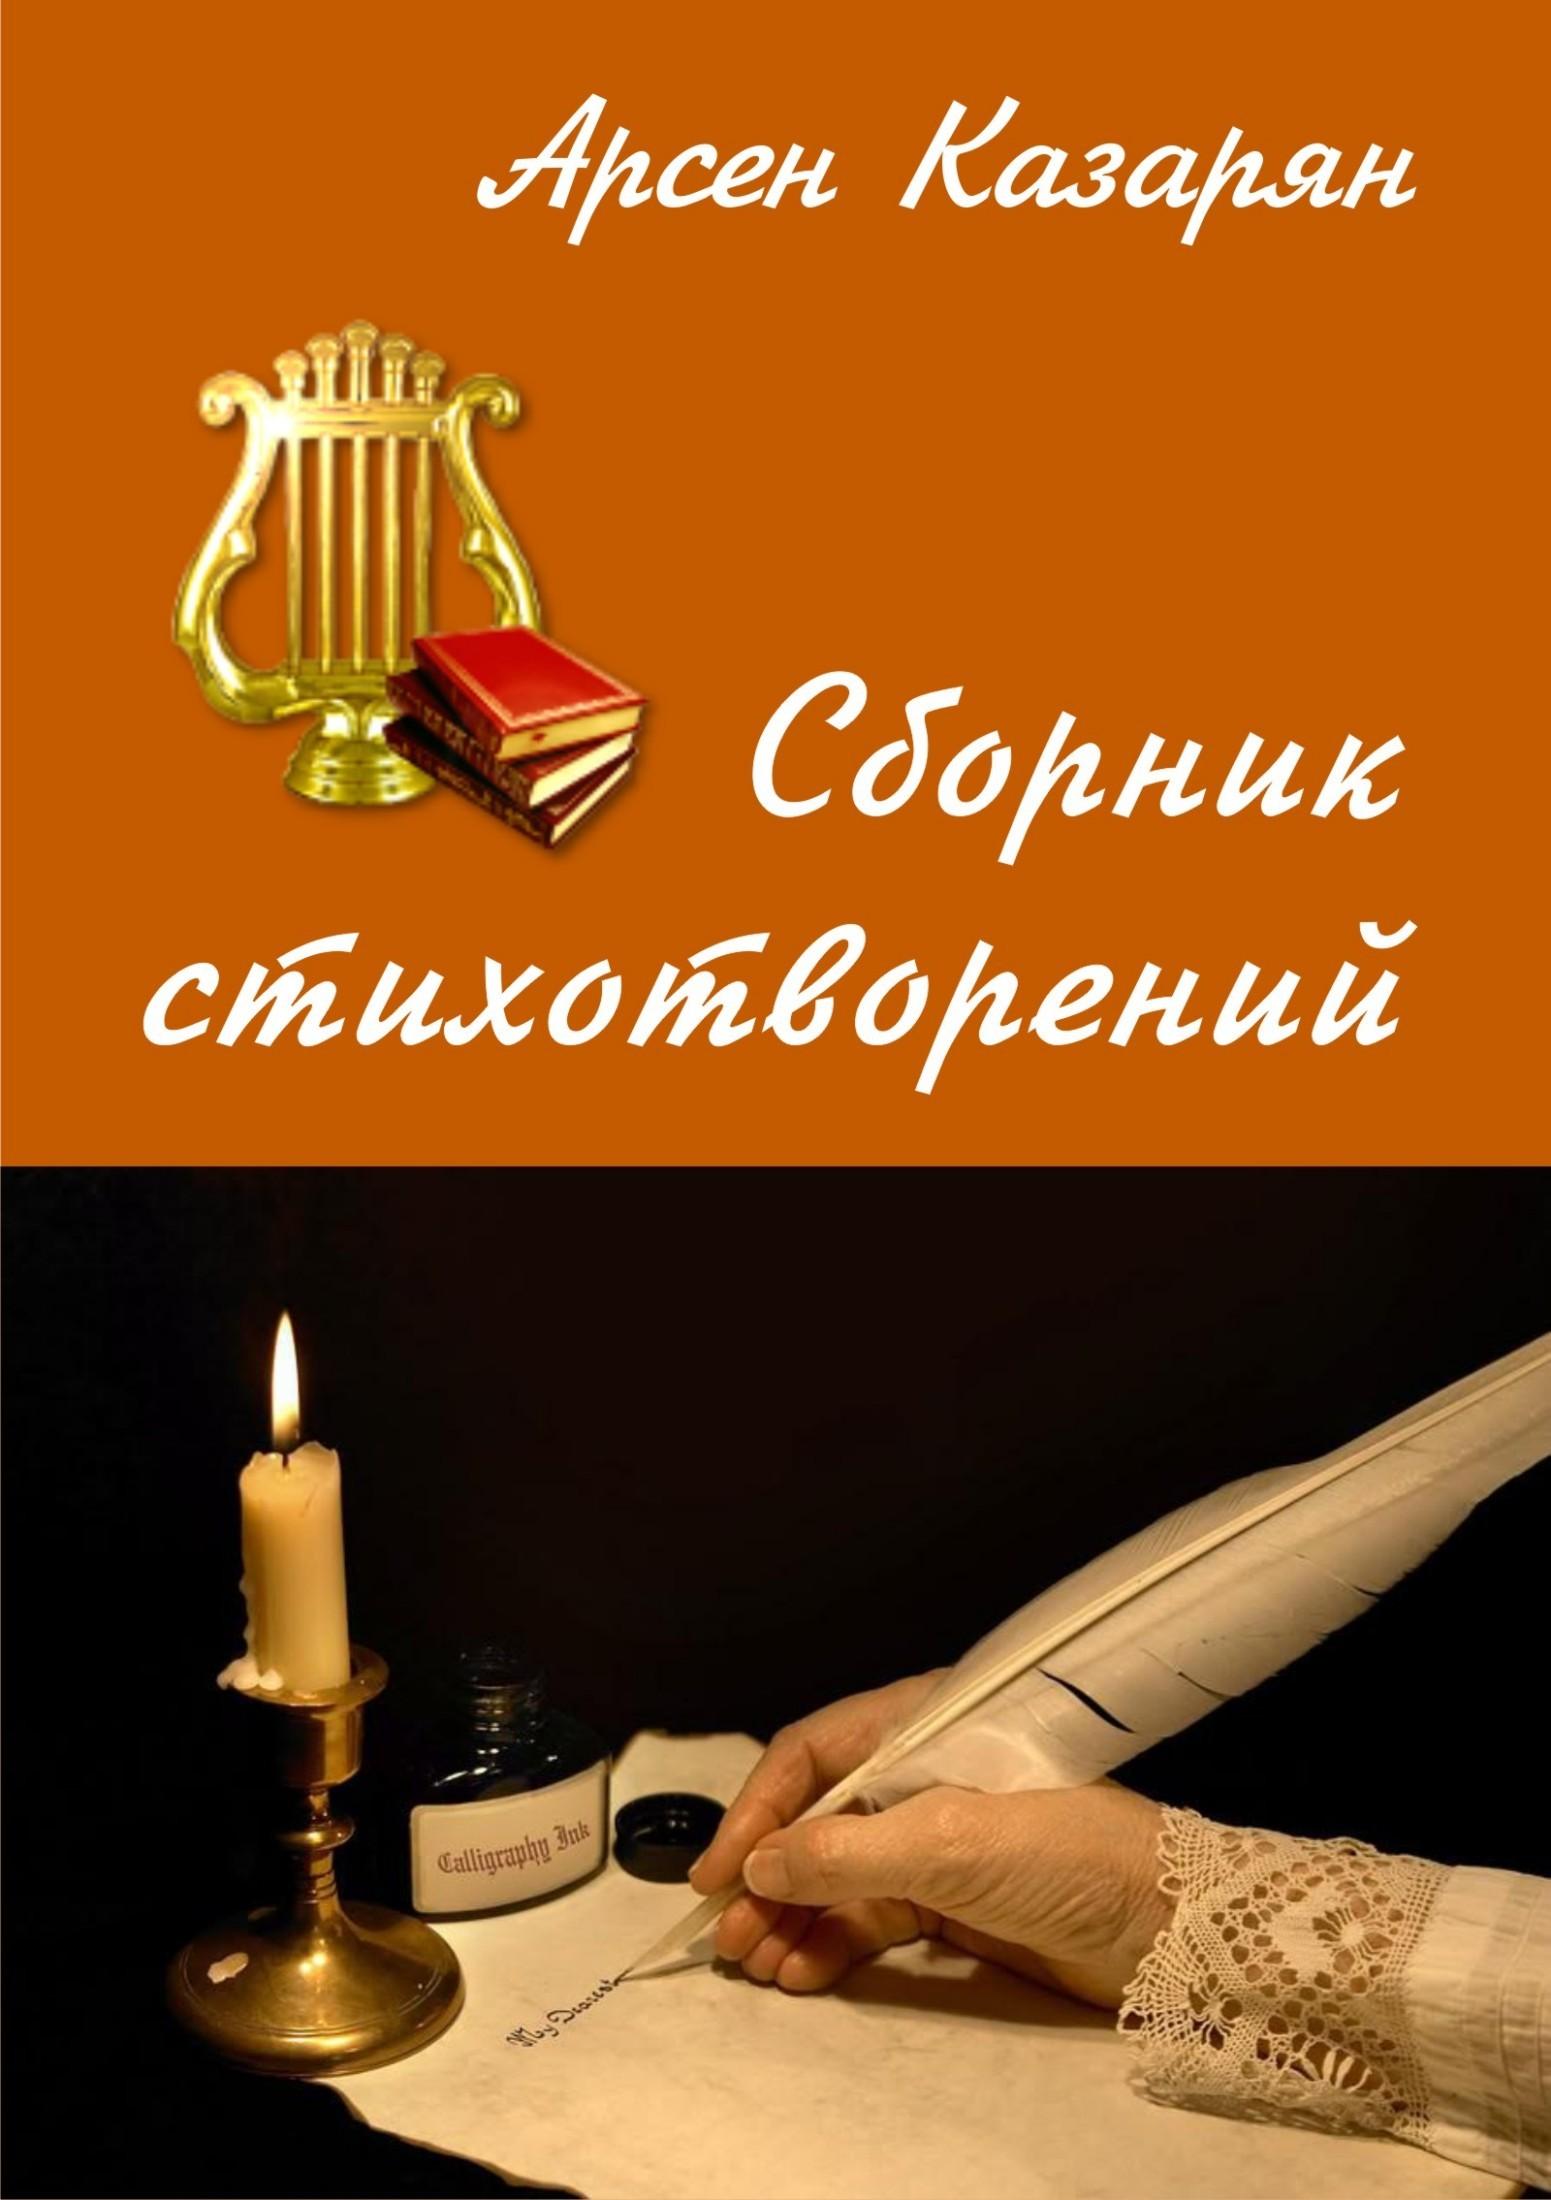 Арсен Суренович Казарян Сборник стихотворений арсен даллан автономный человек